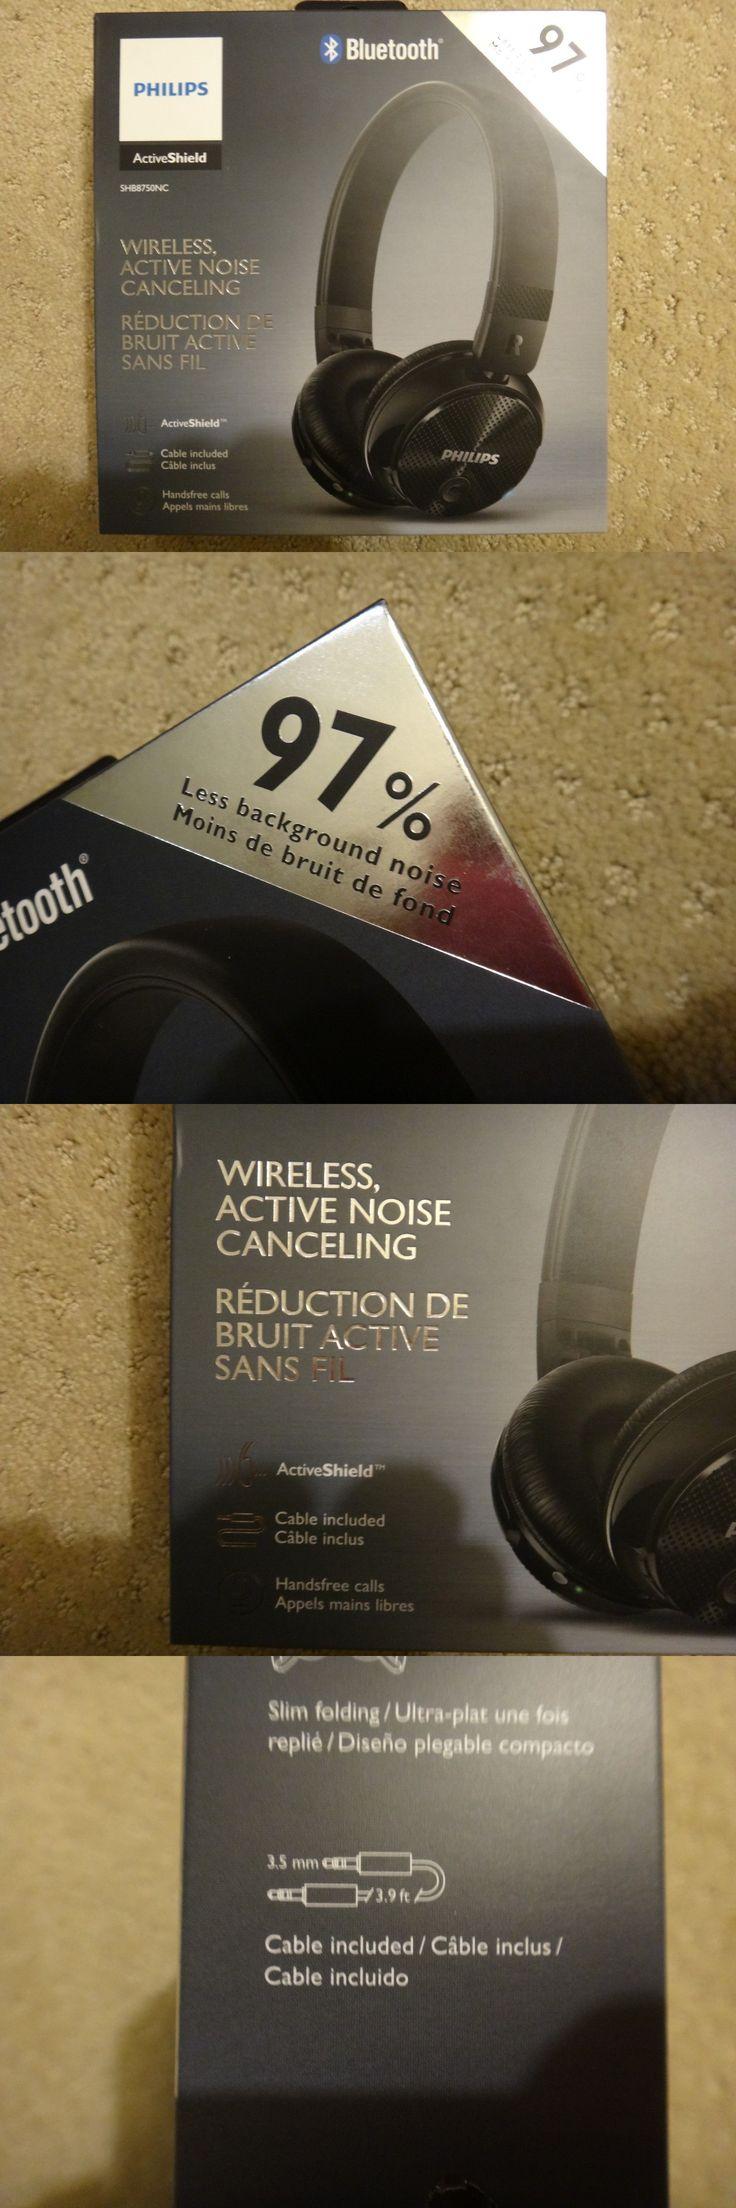 Headphones: New ! Philips Wireless Noise Canceling Headphones Blk # Shb8750nc 27 -> BUY IT NOW ONLY: $35.99 on eBay!